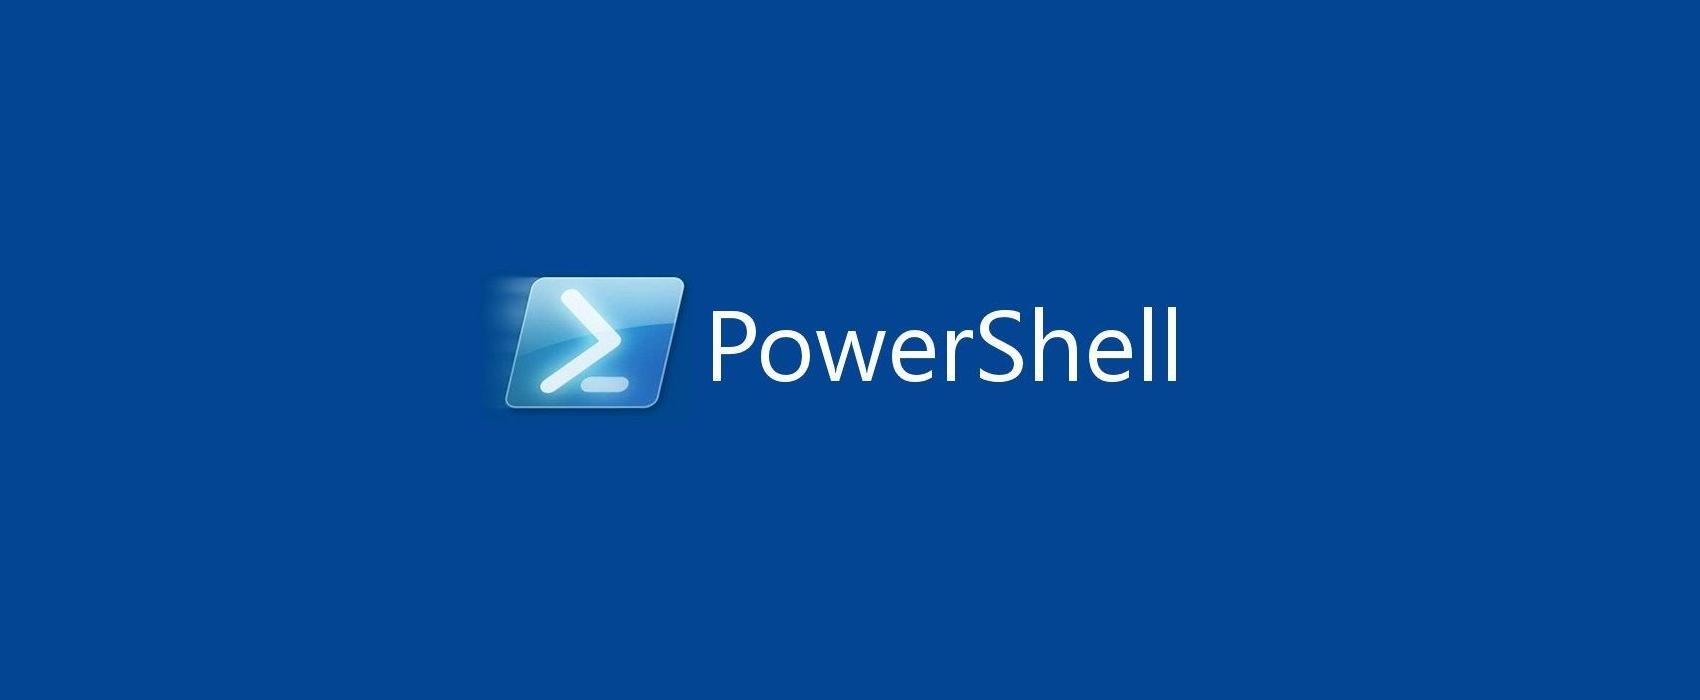 PowerShell Script Wallpaper